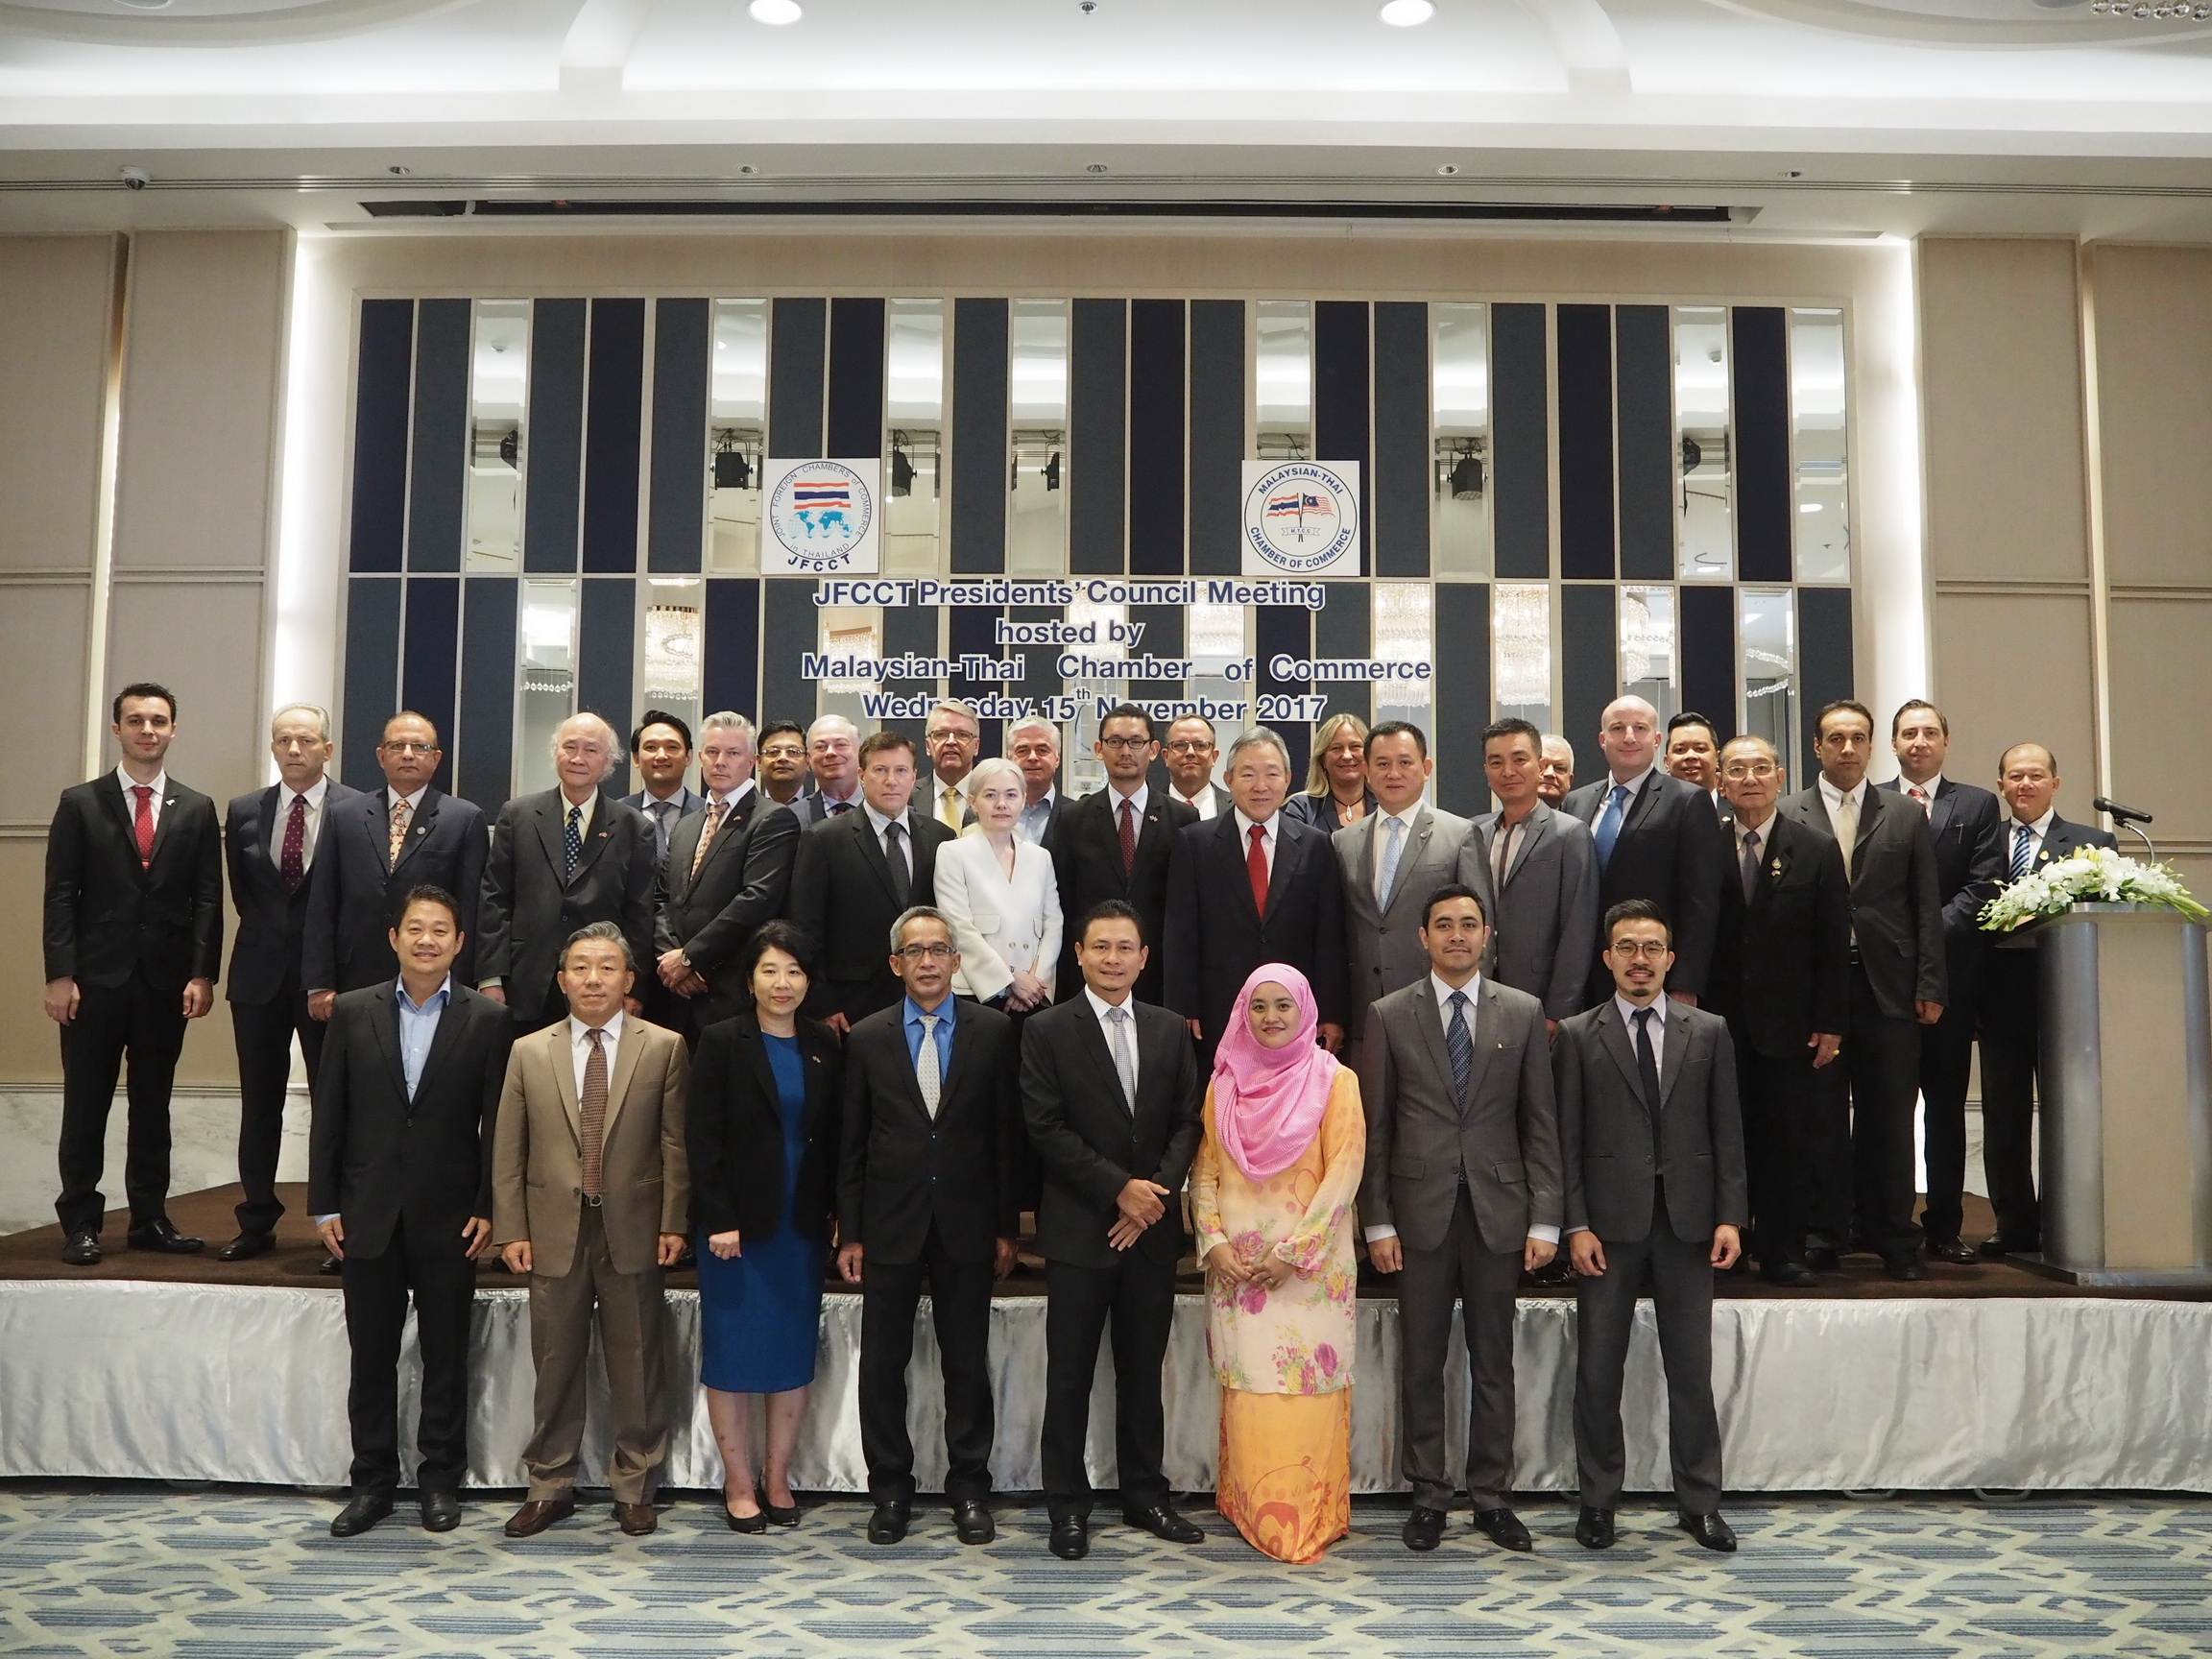 JFCCT-Presidents-Council-meeting-November-2017